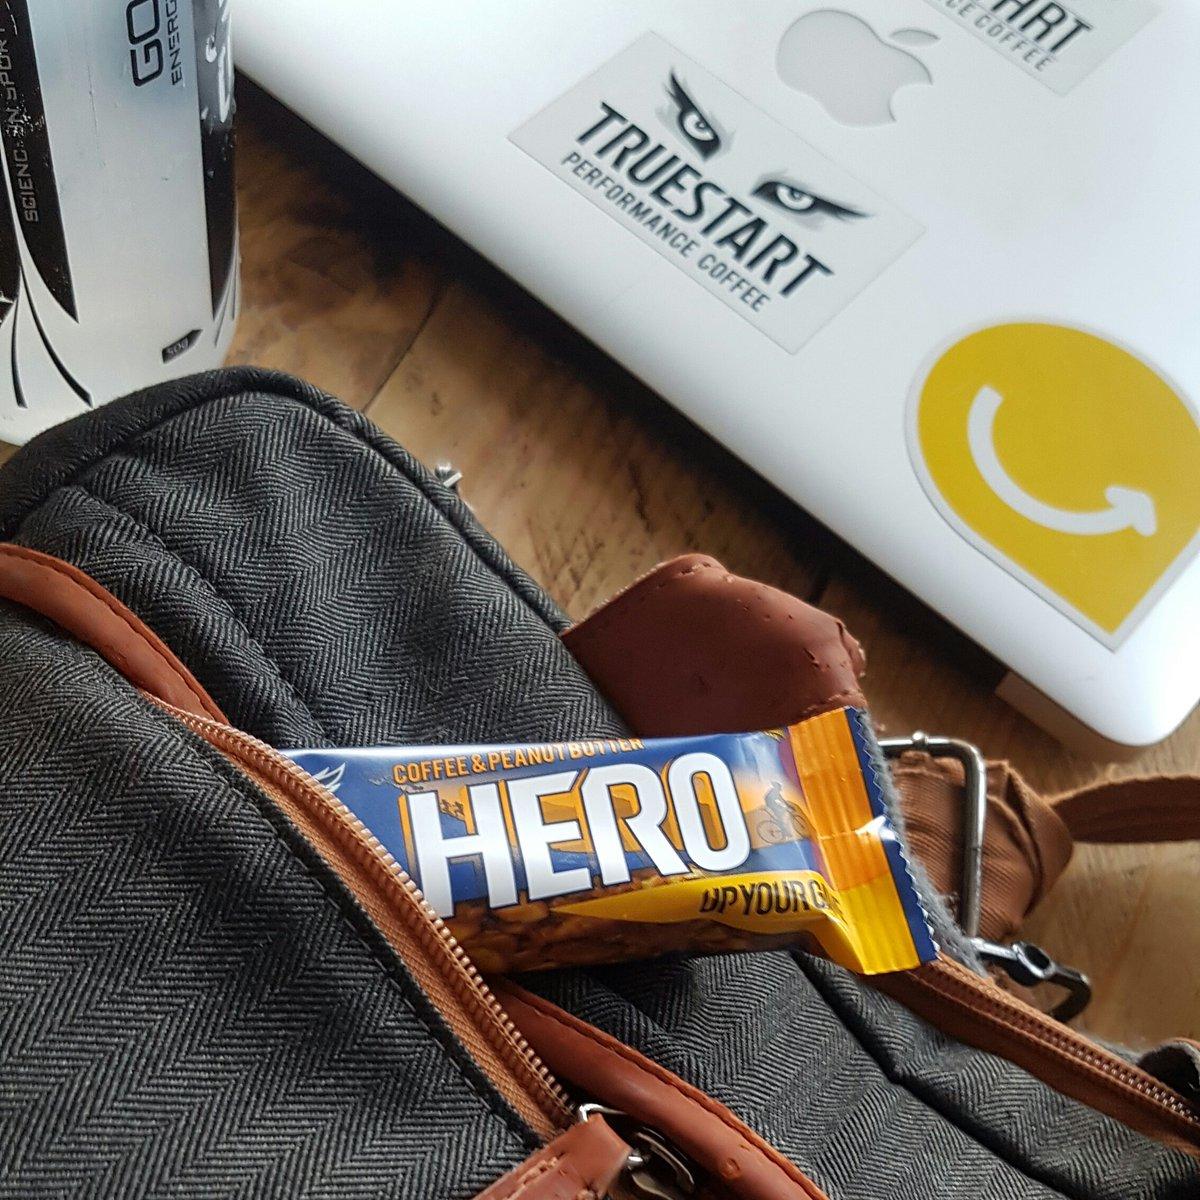 RT @simonhills58: Big days require big snacks!! #HeroBar #TeamTrueStart #UpYourGame #coffee #caffeine https://t.co/Higsey8Dvb